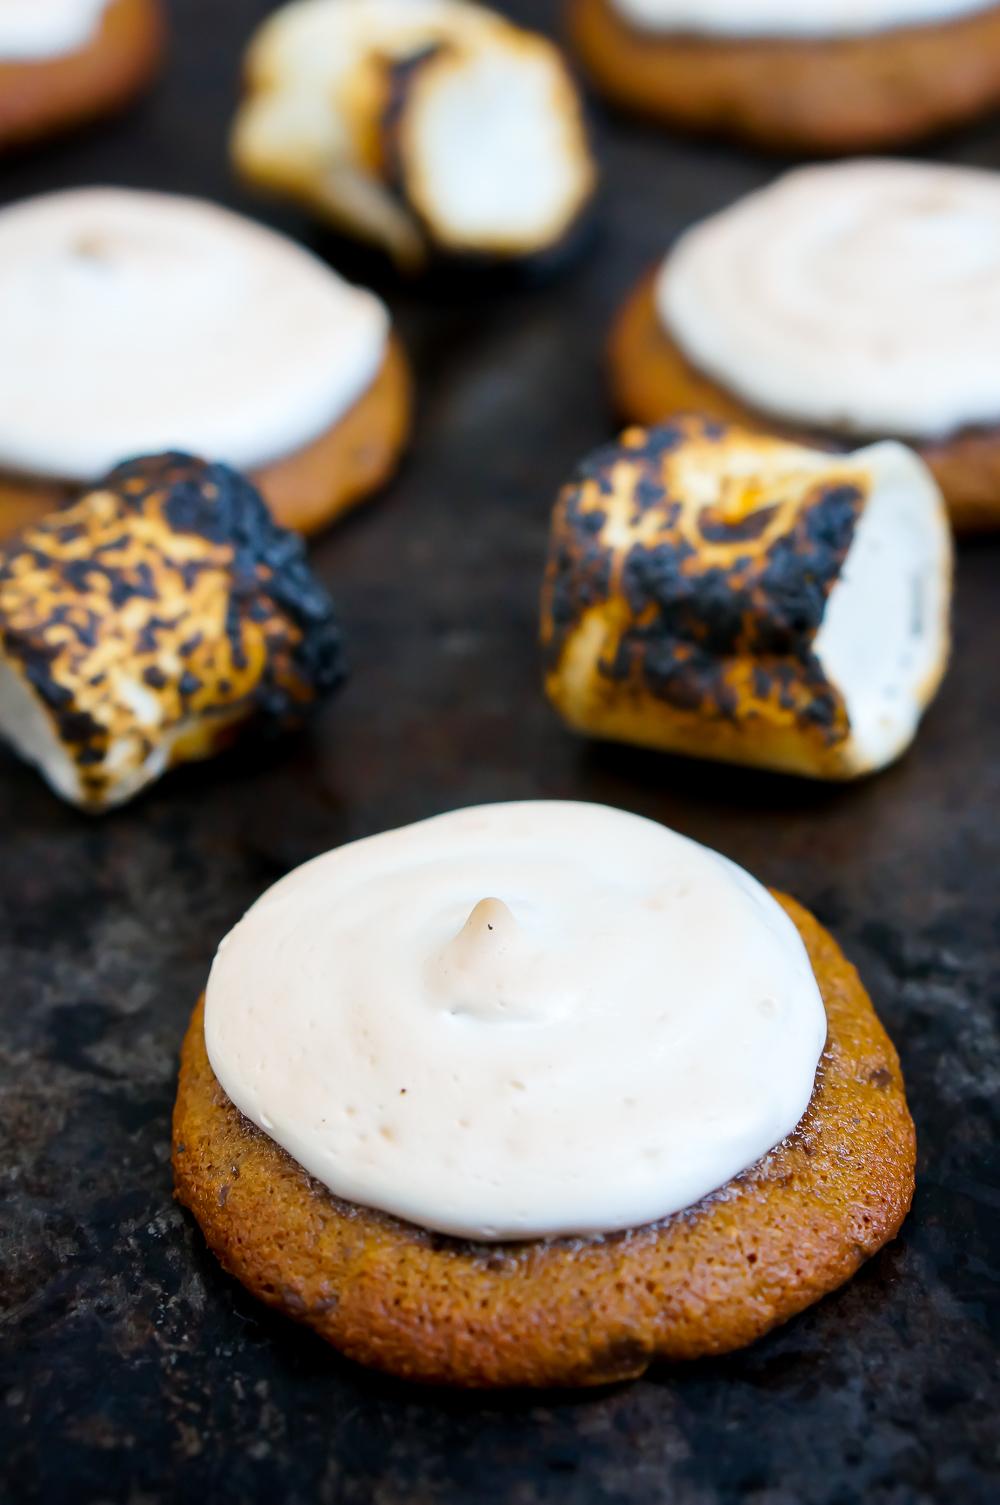 S'mores Cookies (Gluten Free, Grain Free, Dairy Free, Refined Sugar Free, Paleo)